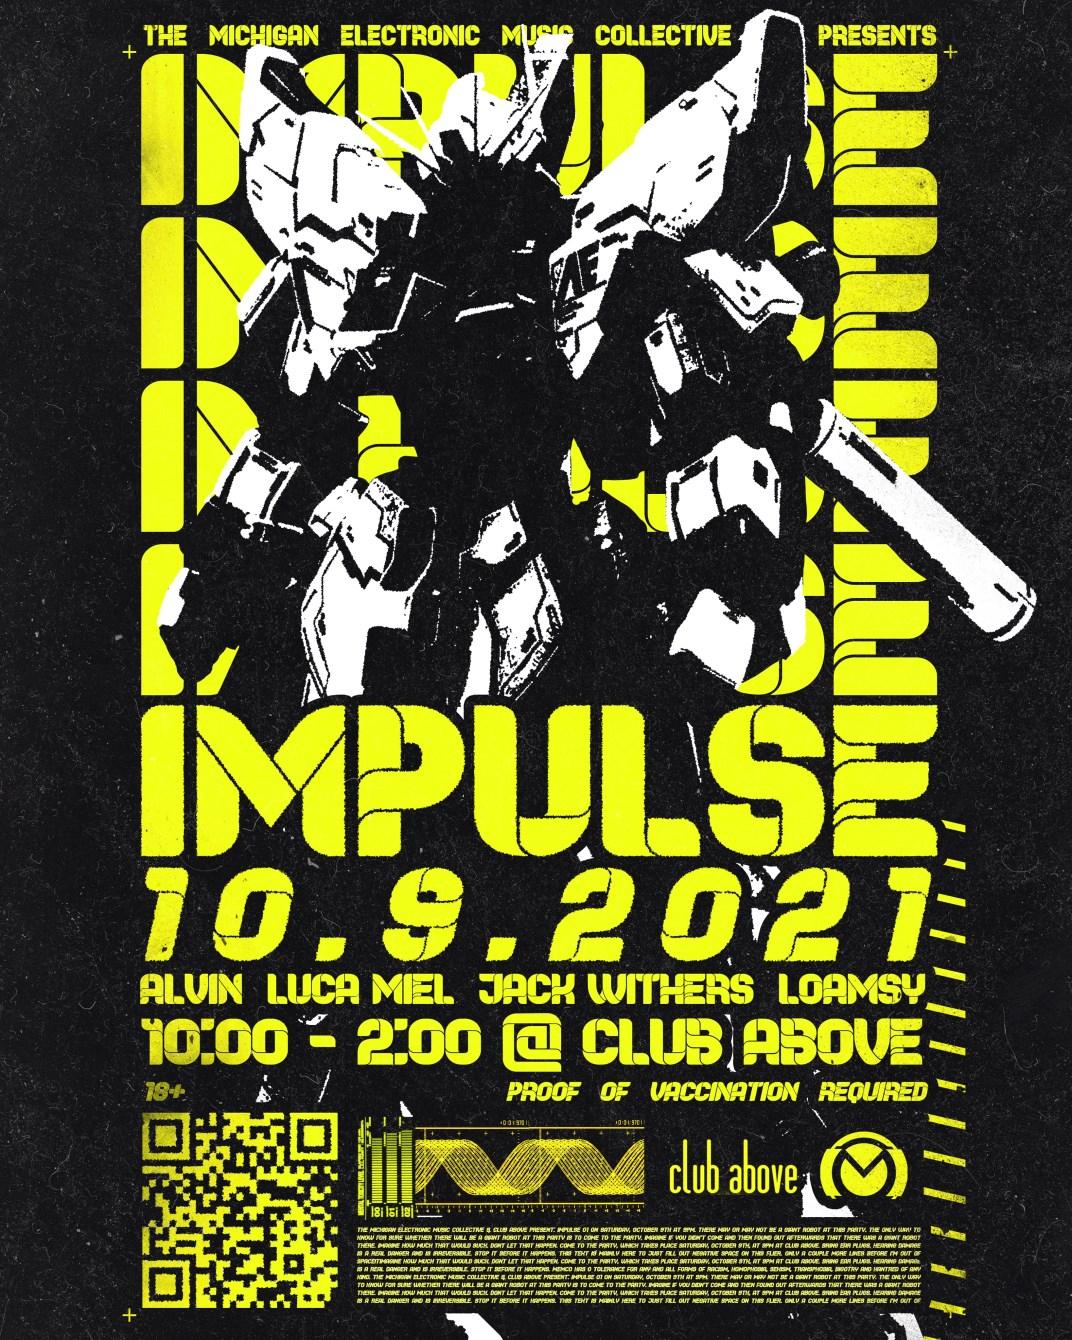 Memco presents Impulse 01 - Flyer front